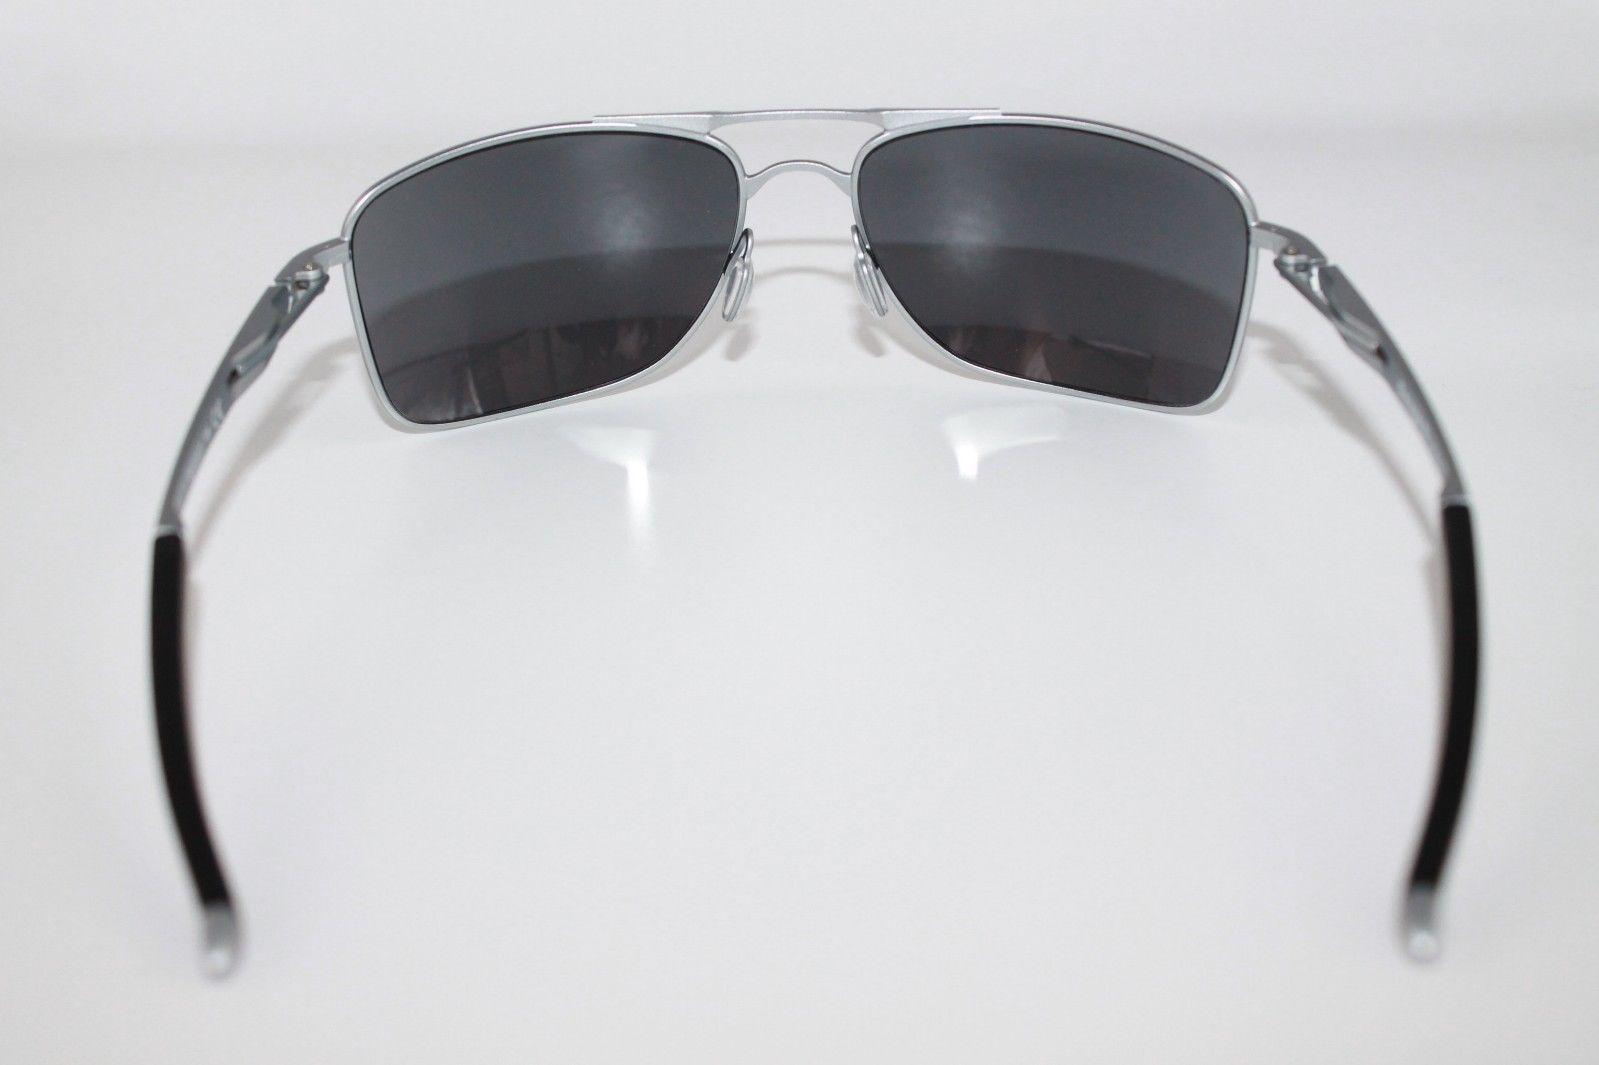 Oakley Gauge 8 Sunglasses OO4124-07 Matte Lead Frame W/ Black Iridium Lens